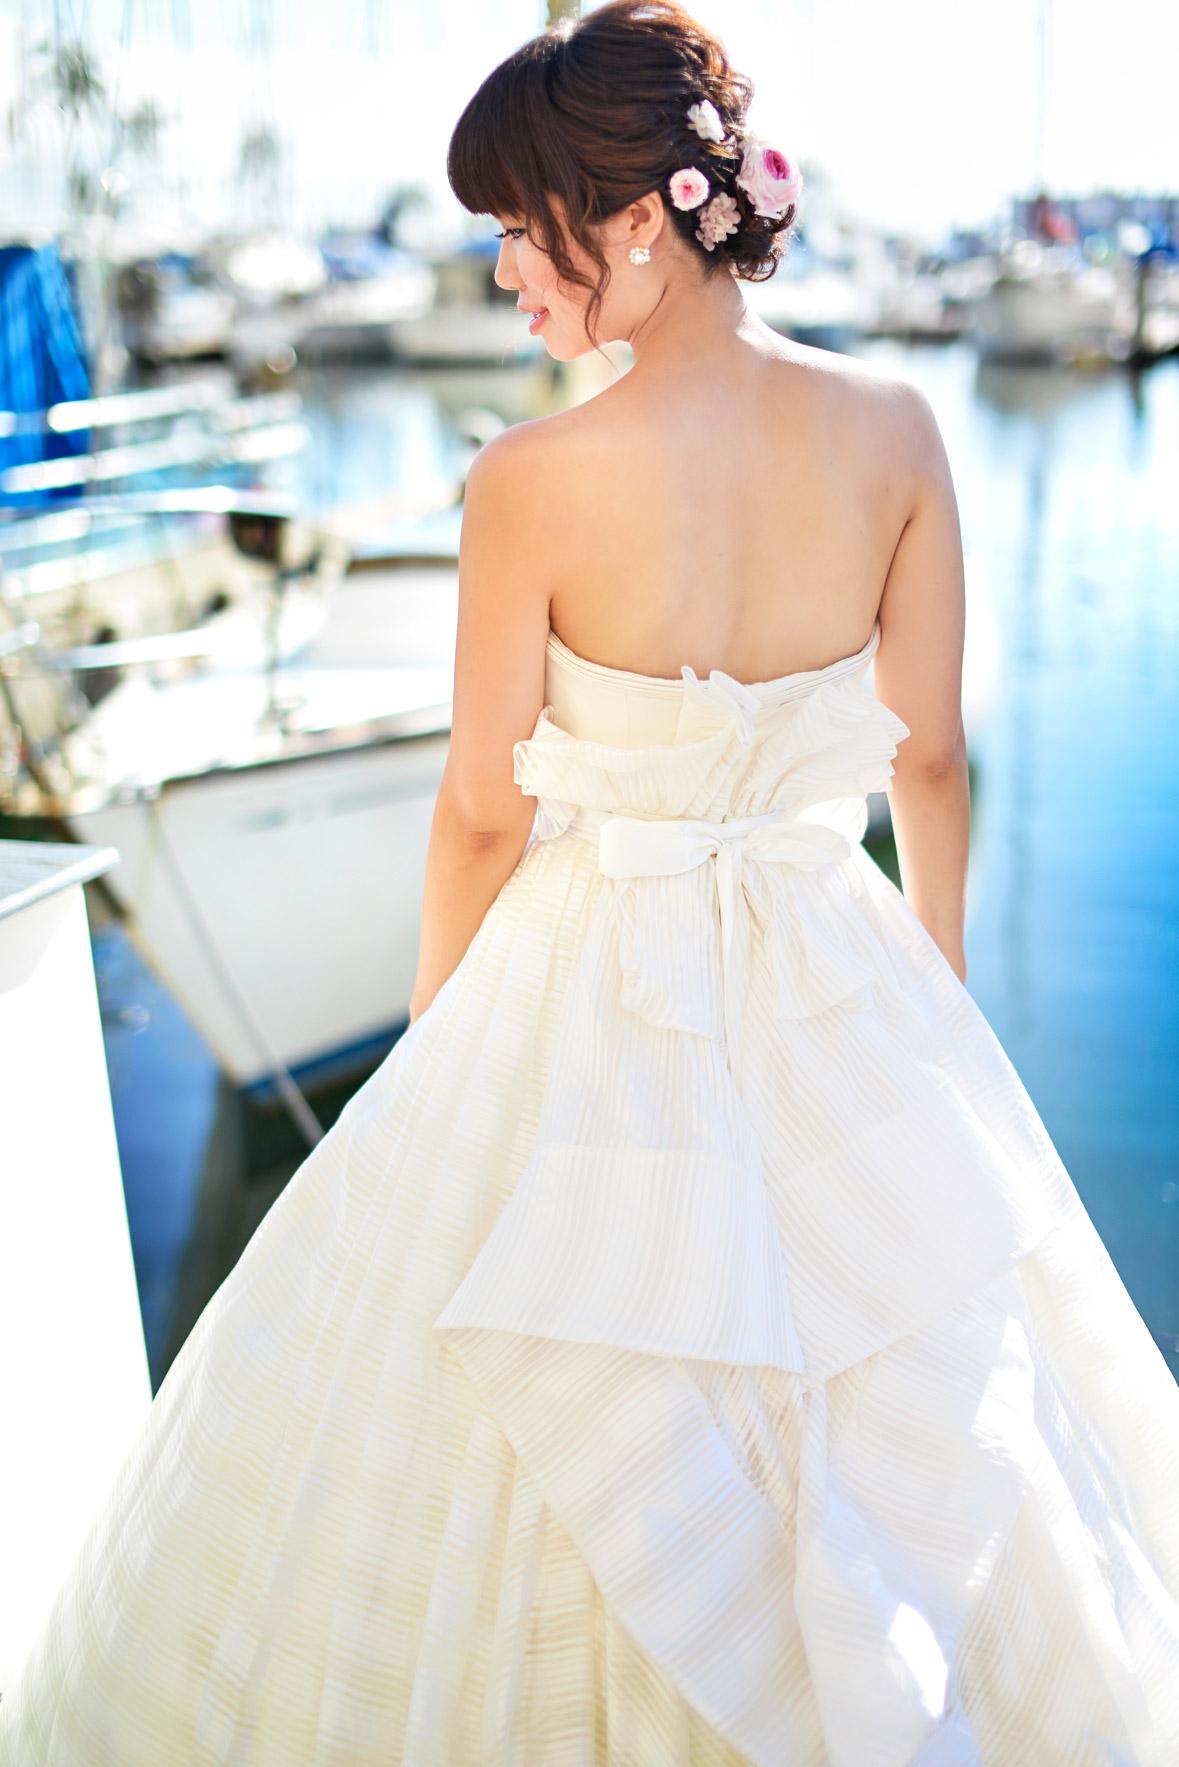 waikiki-beach-wedding-and-downtown-honolulu-hawaii-theater-stephen-ludwig-photography019.jpg